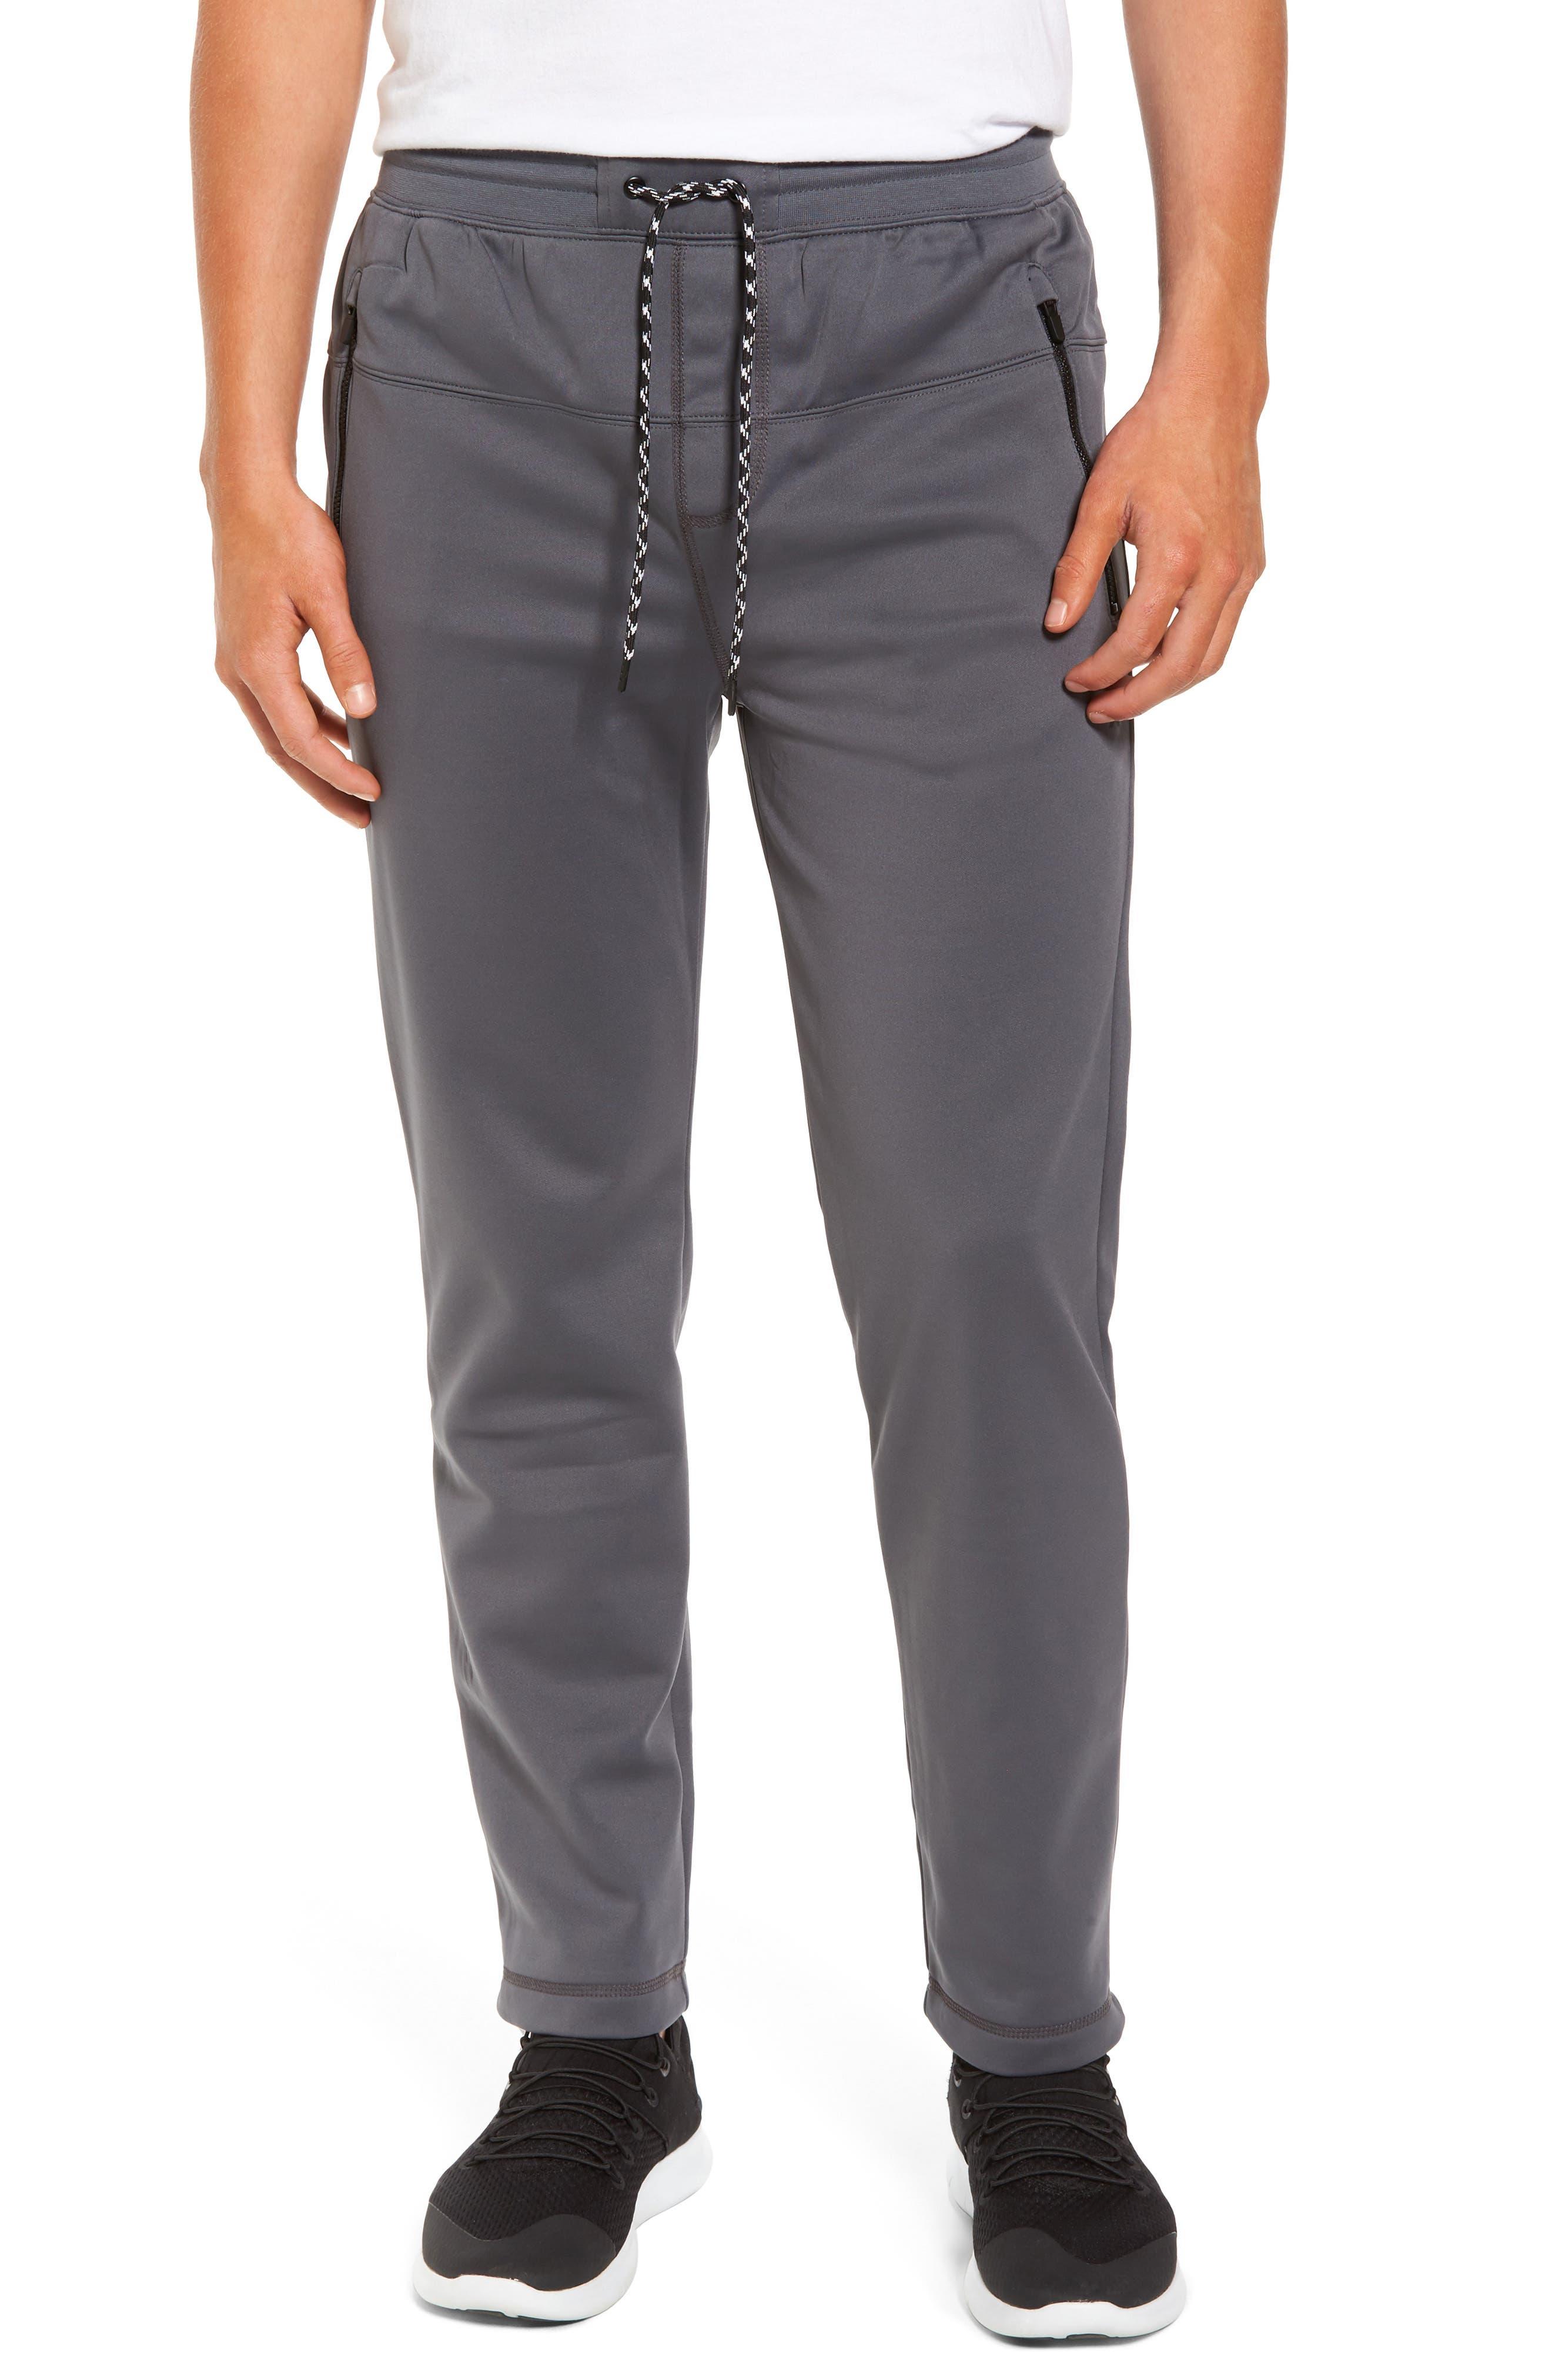 Main Image - Hurley Therma Protect Pants